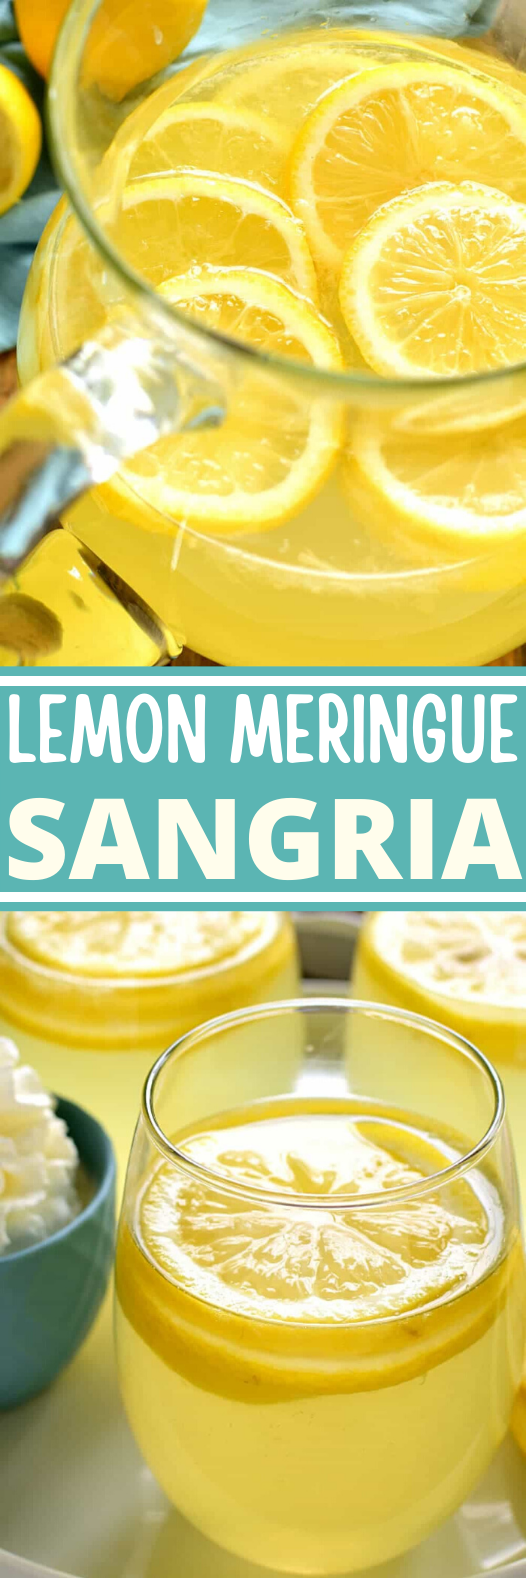 Lemon Meringue Sangria #summer #drink #recipes #brunch #sangria